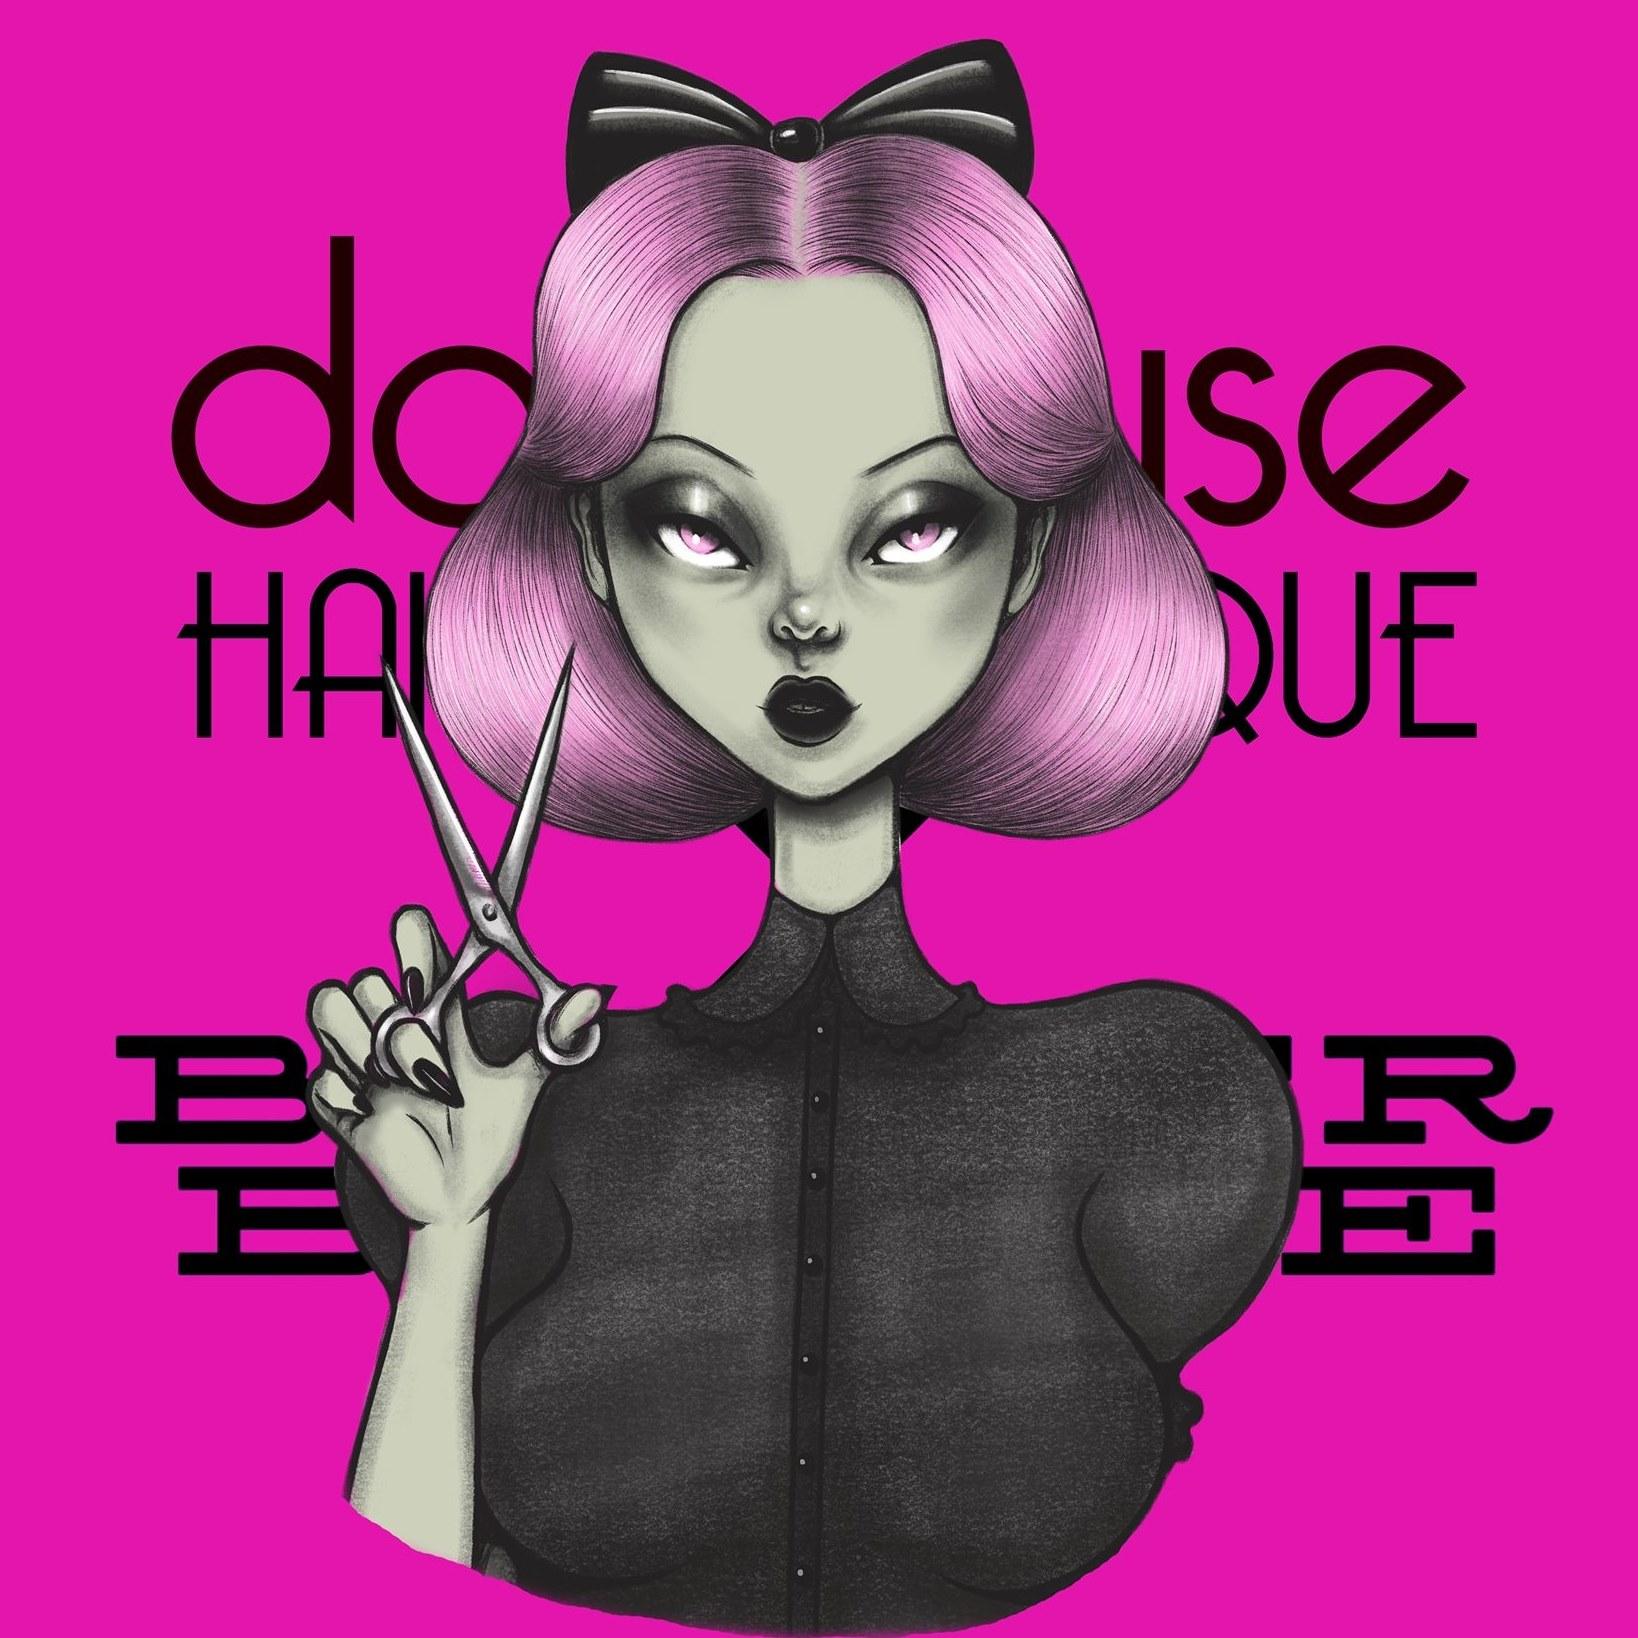 Dollhouse - snip snip